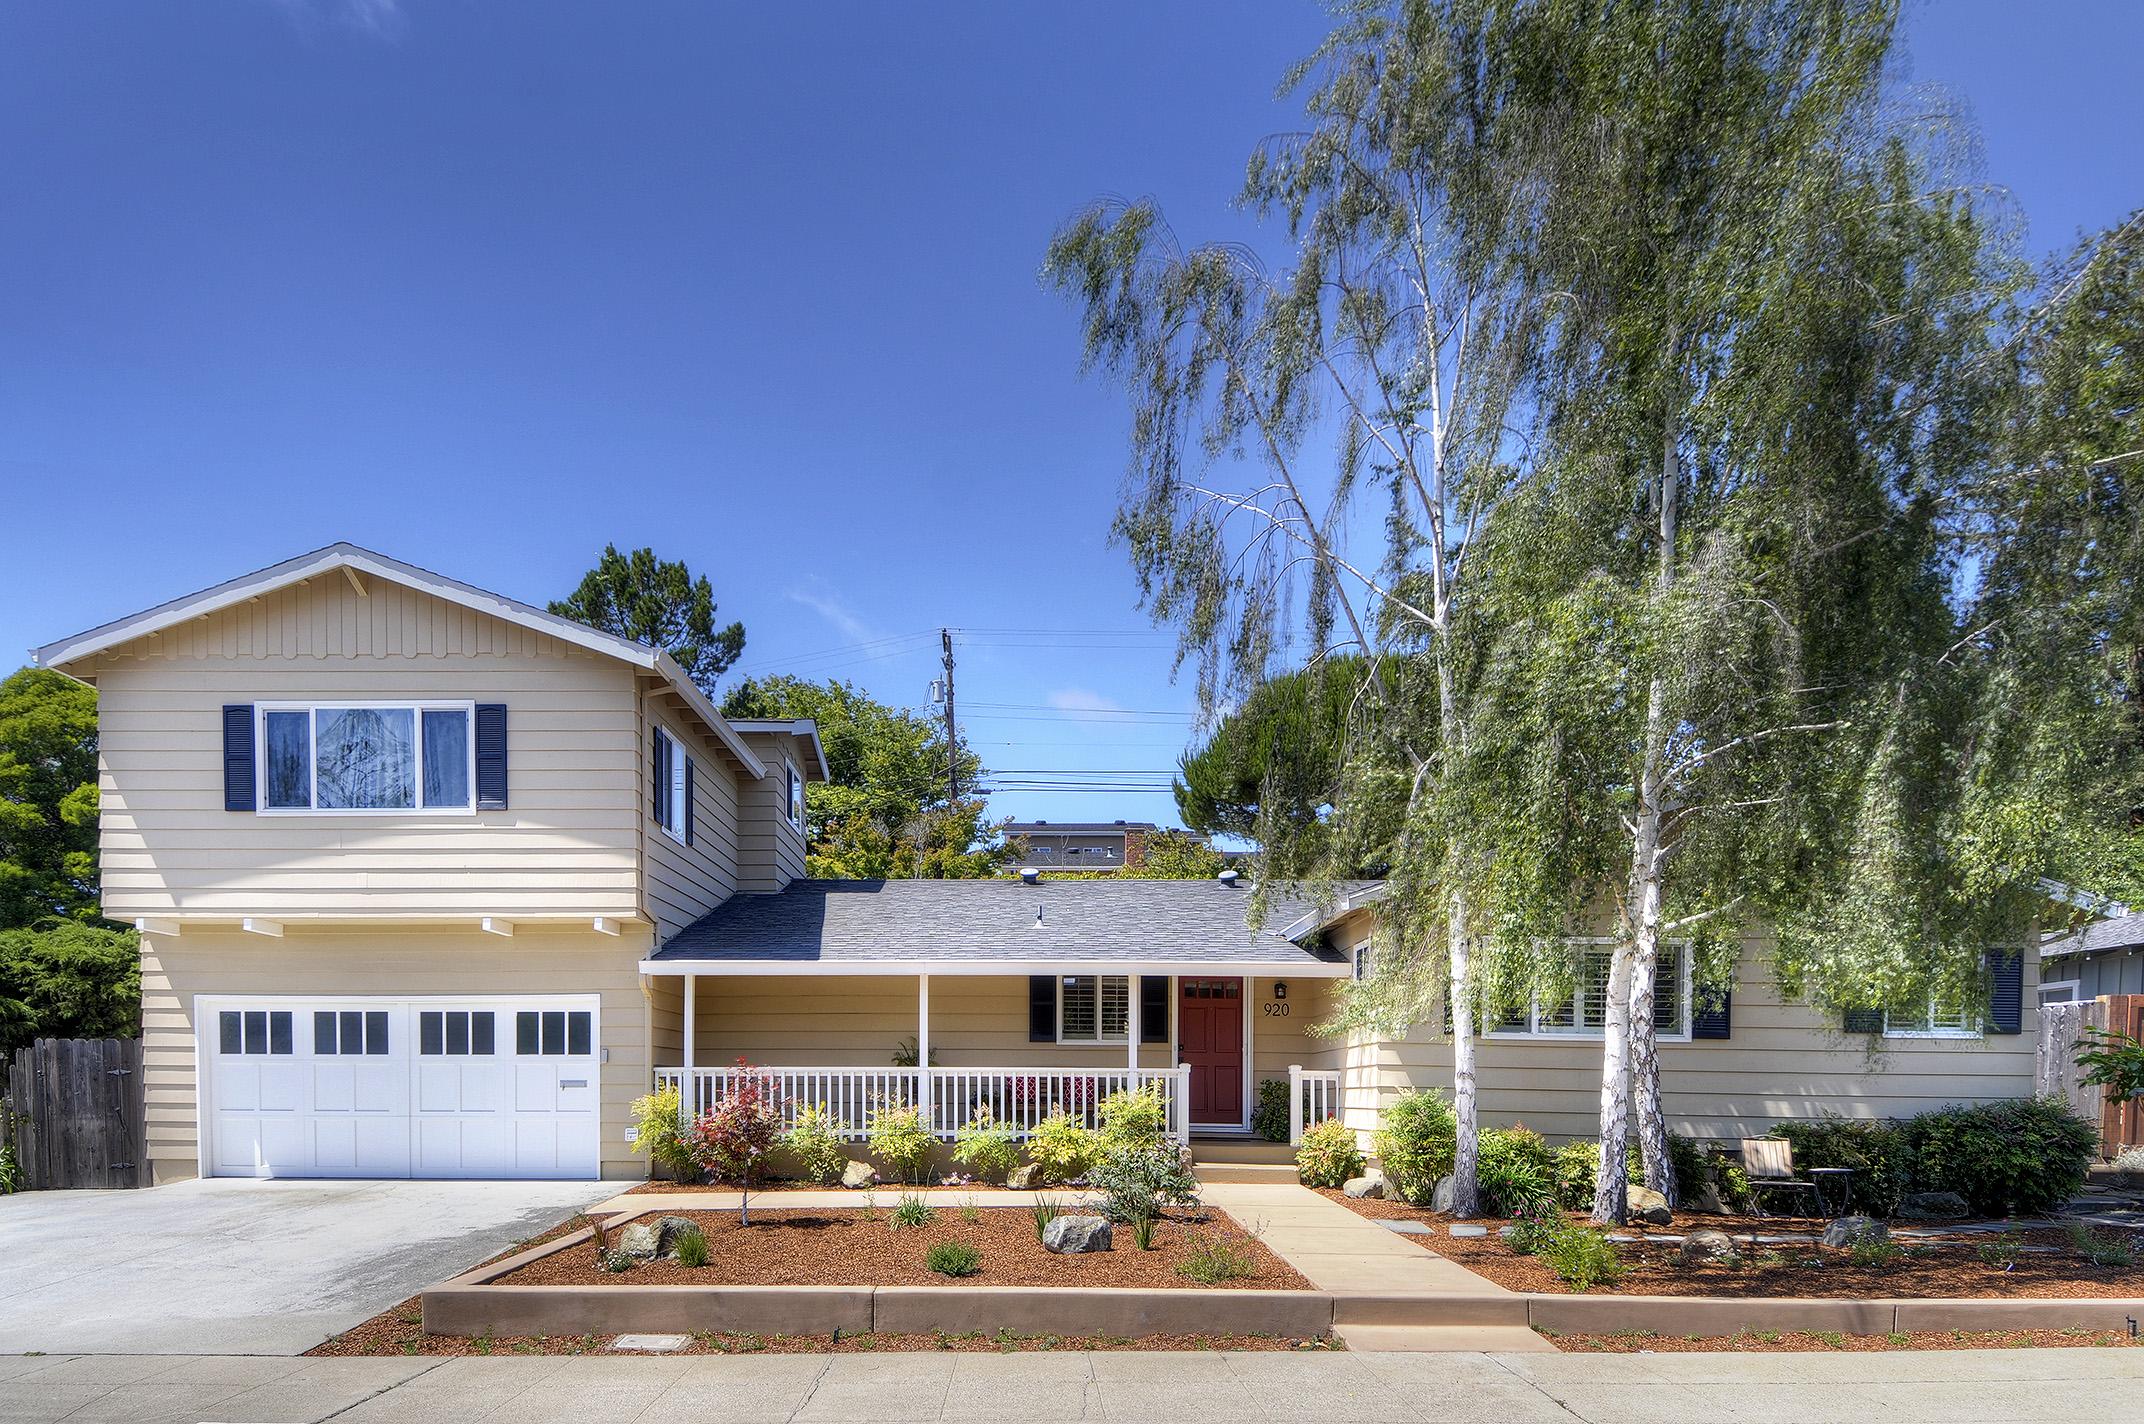 920 Pleasant Hill Rd, Redwood City, CA 94061